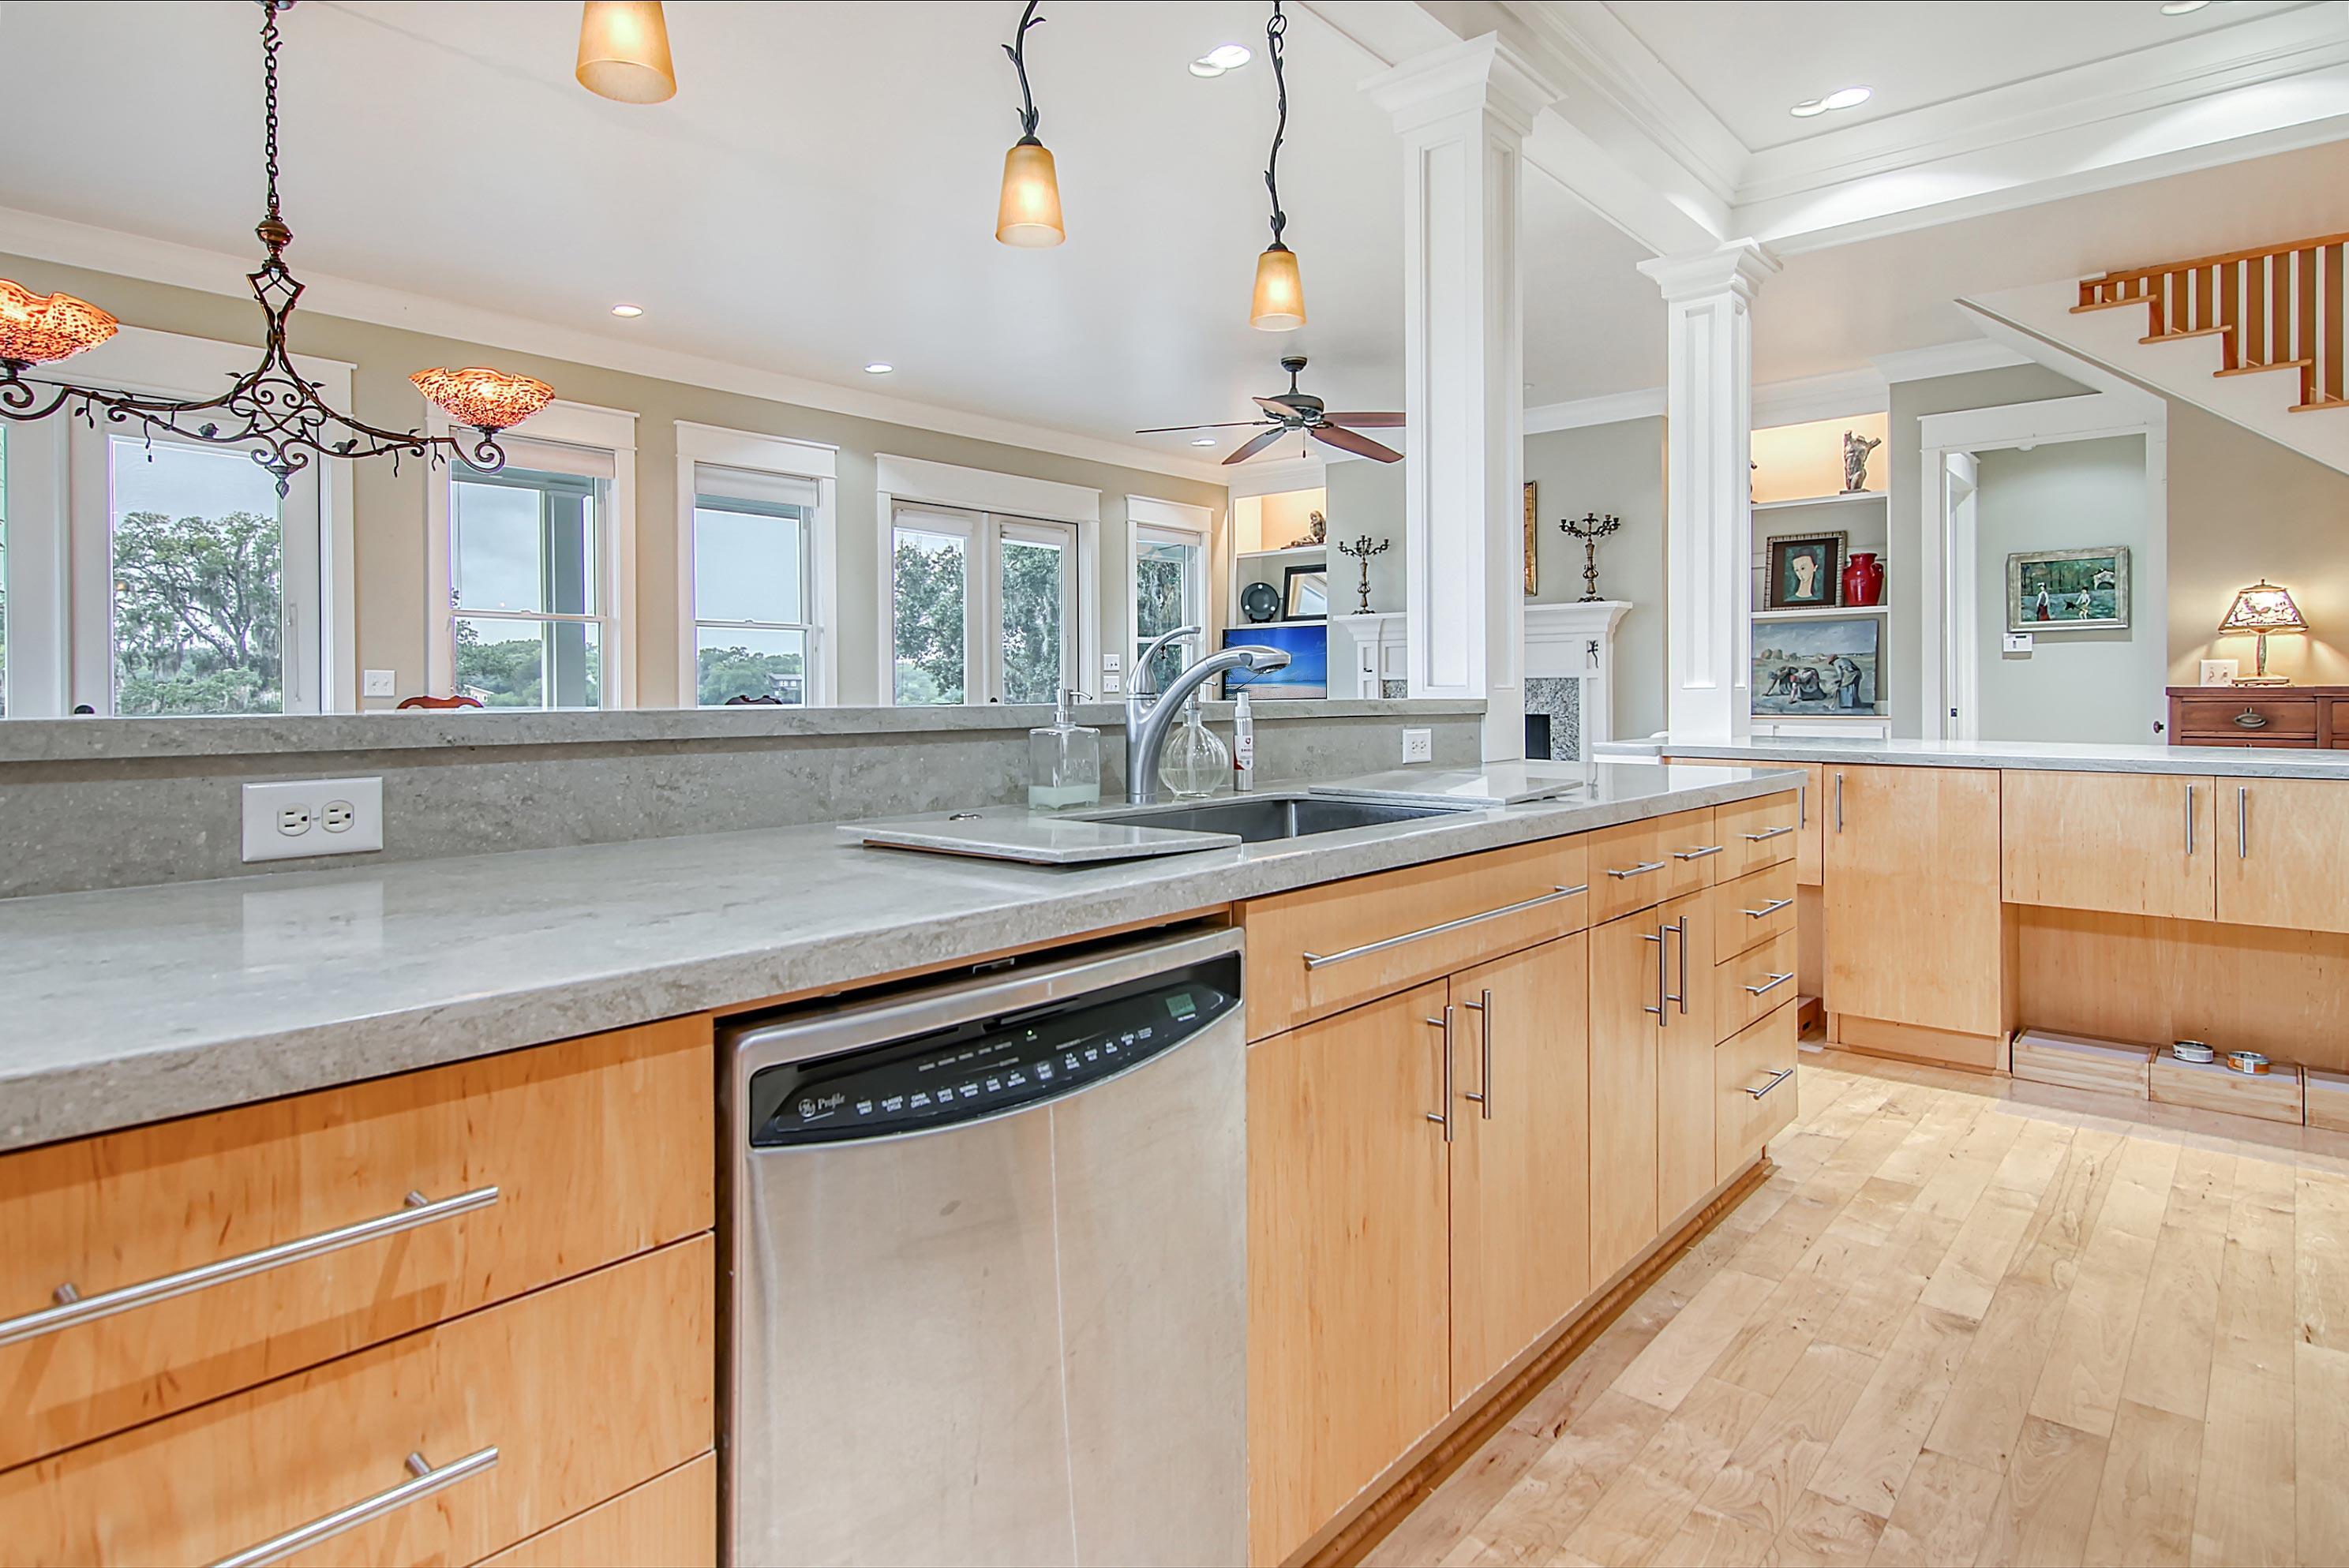 Scanlonville Homes For Sale - 152 6th, Mount Pleasant, SC - 5